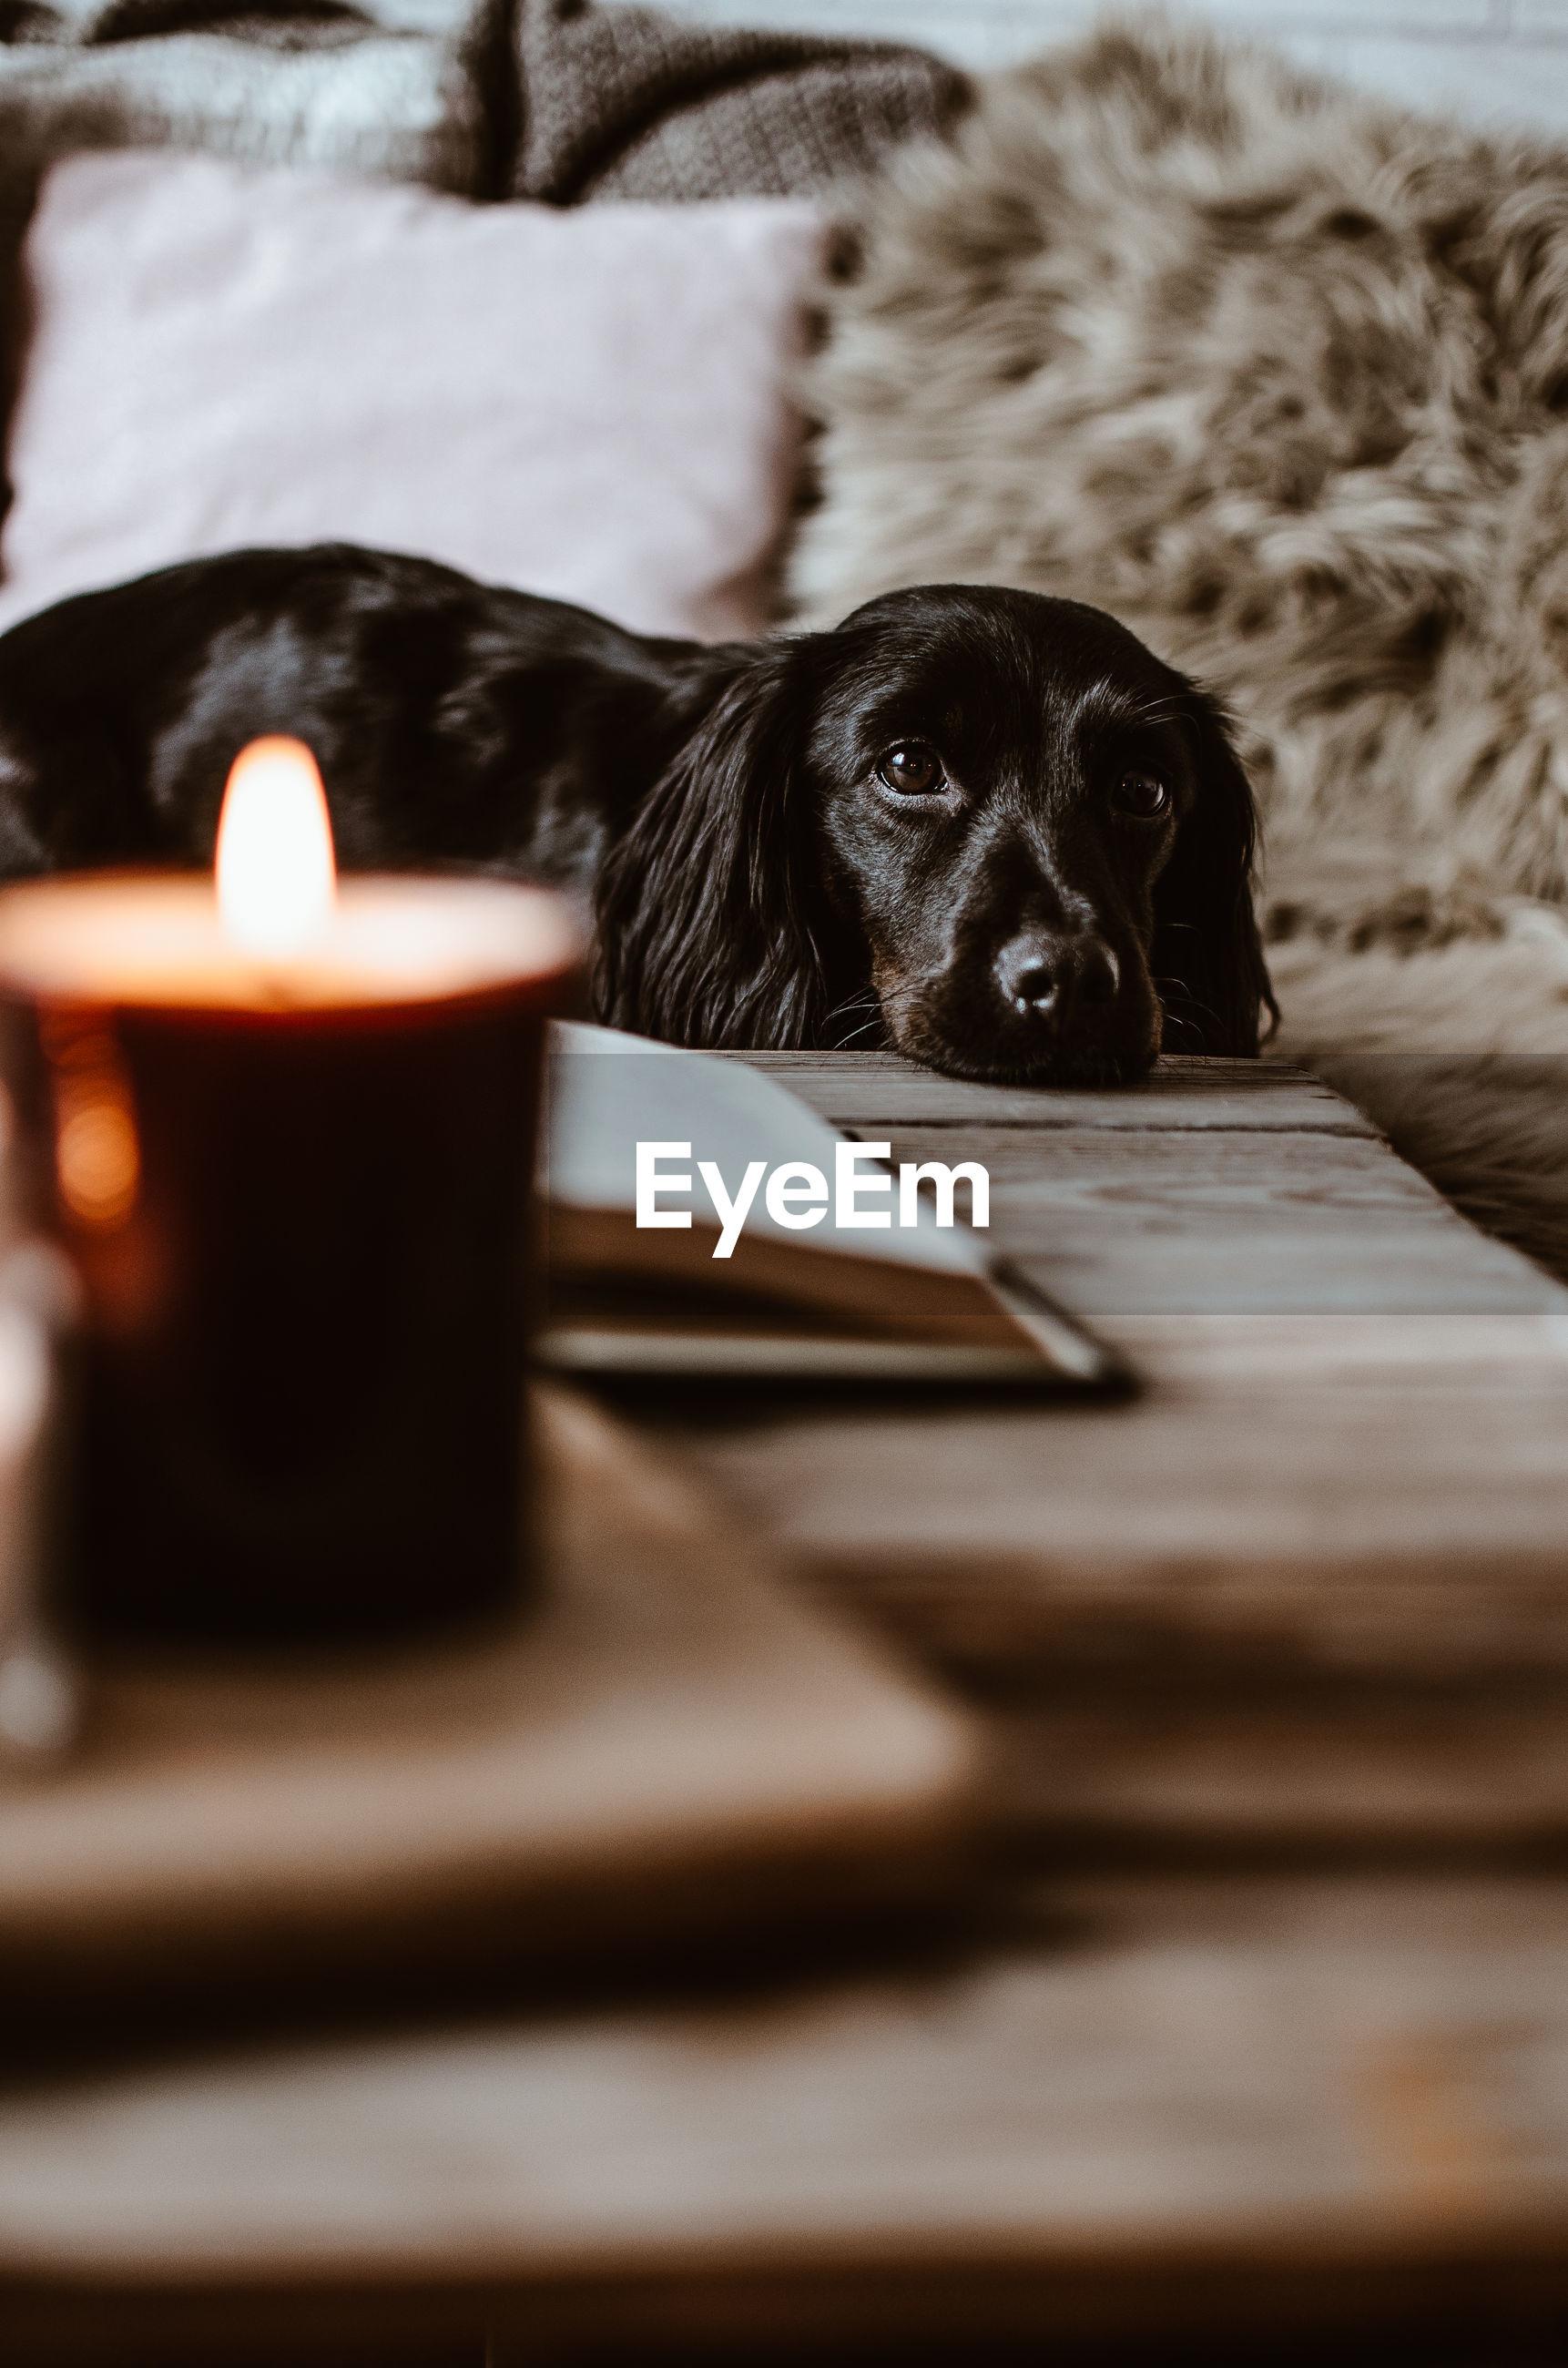 Close-up portrait of dog resting against illuminated candle